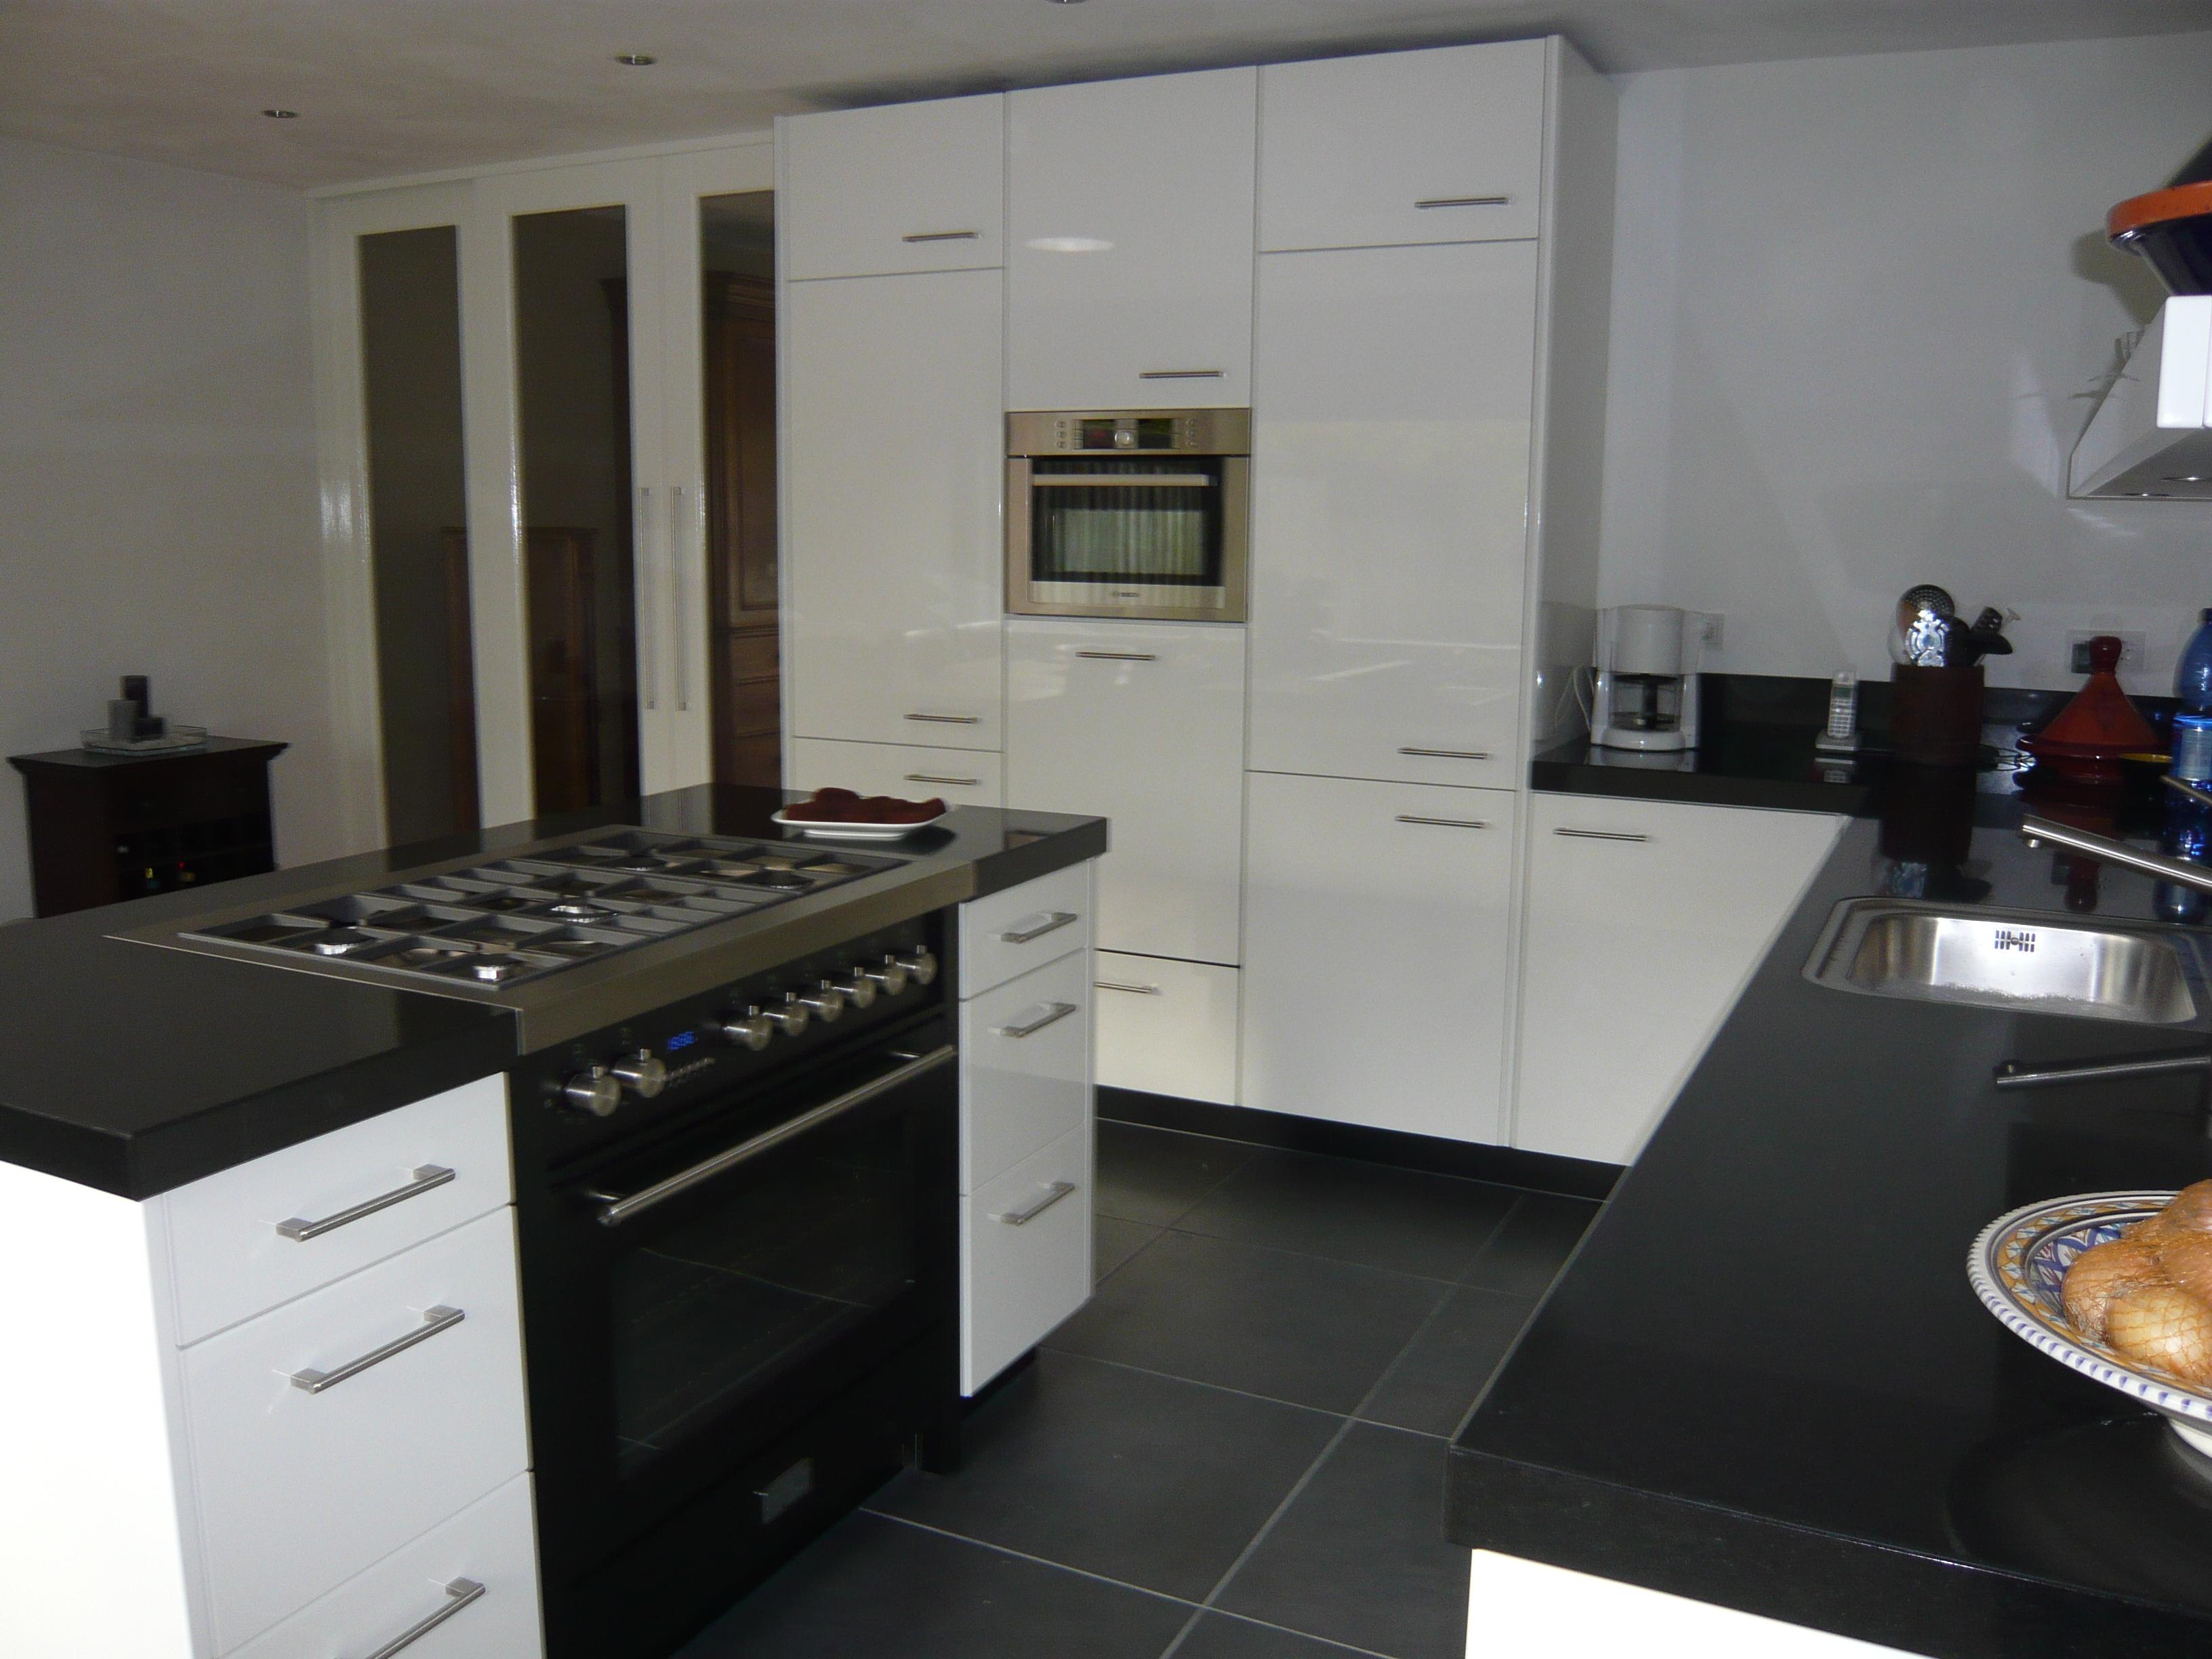 Keuken hofstra peter hendriks keukens - Moderne keuken en woonkamer ...